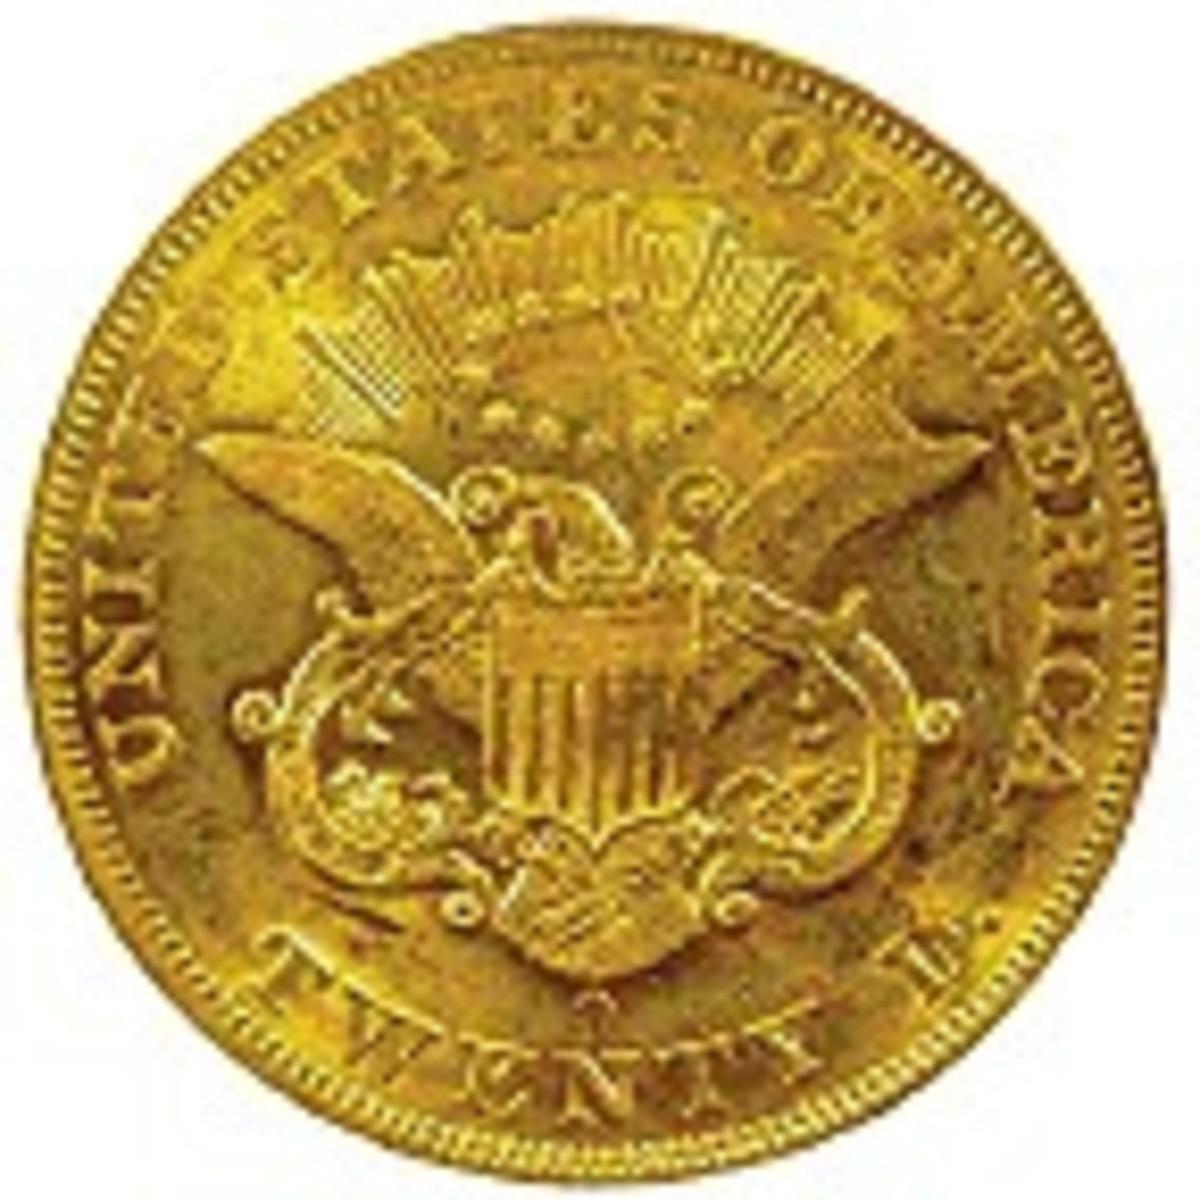 1856-Orevc.jpg